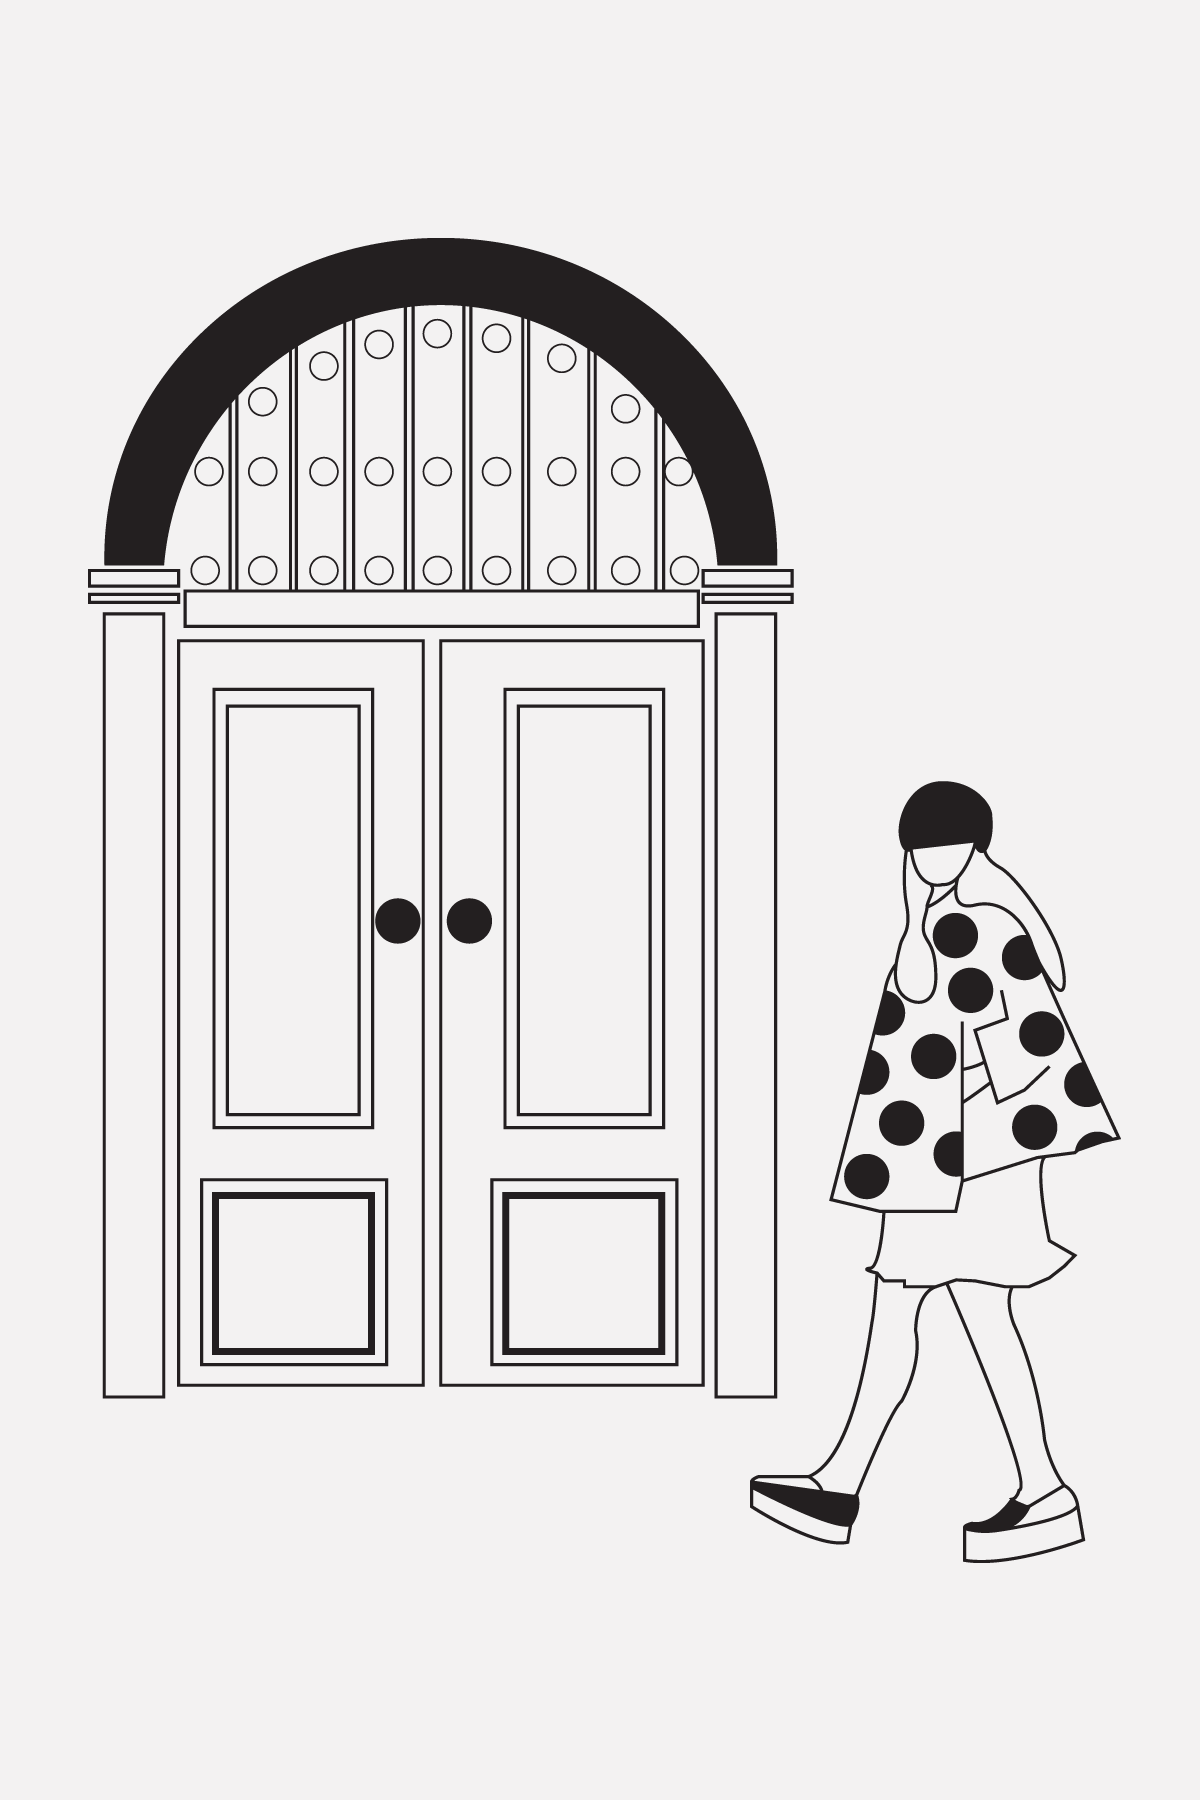 ronabinay: 2D Street Fashion